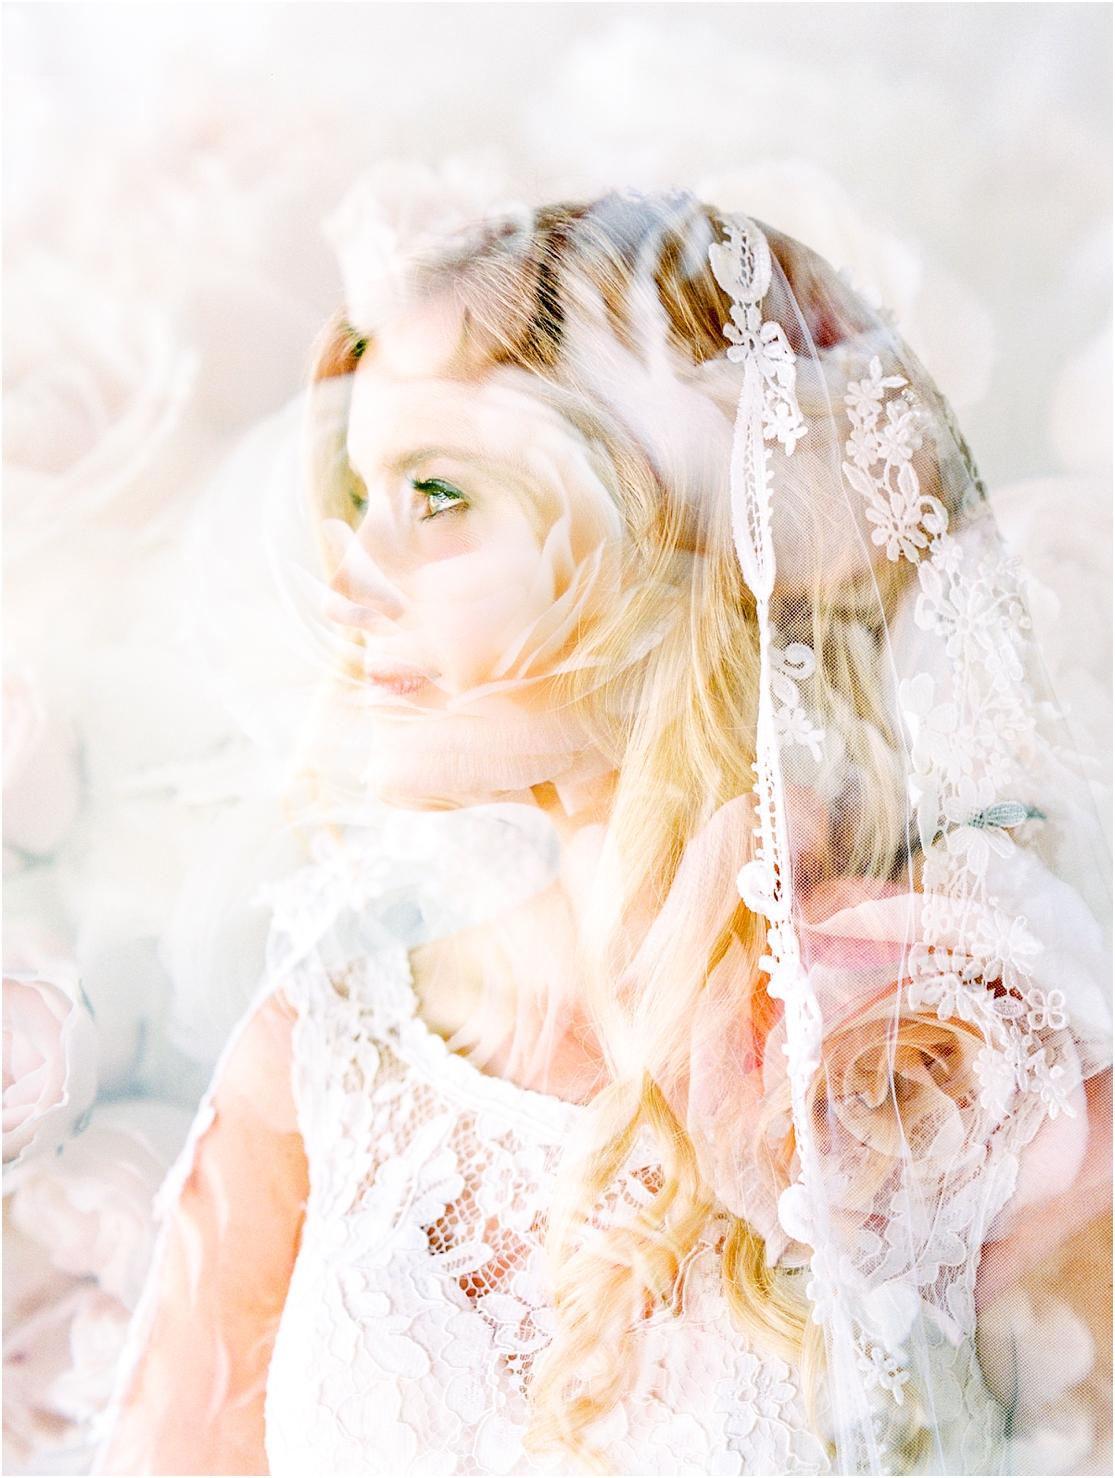 Lisa Silva Photography- Ponte Vedra Beach and Jacksonville, Florida Fine Art Film Wedding Photography- Wedding at the Ponte Vedra Inn and Club_0021.jpg